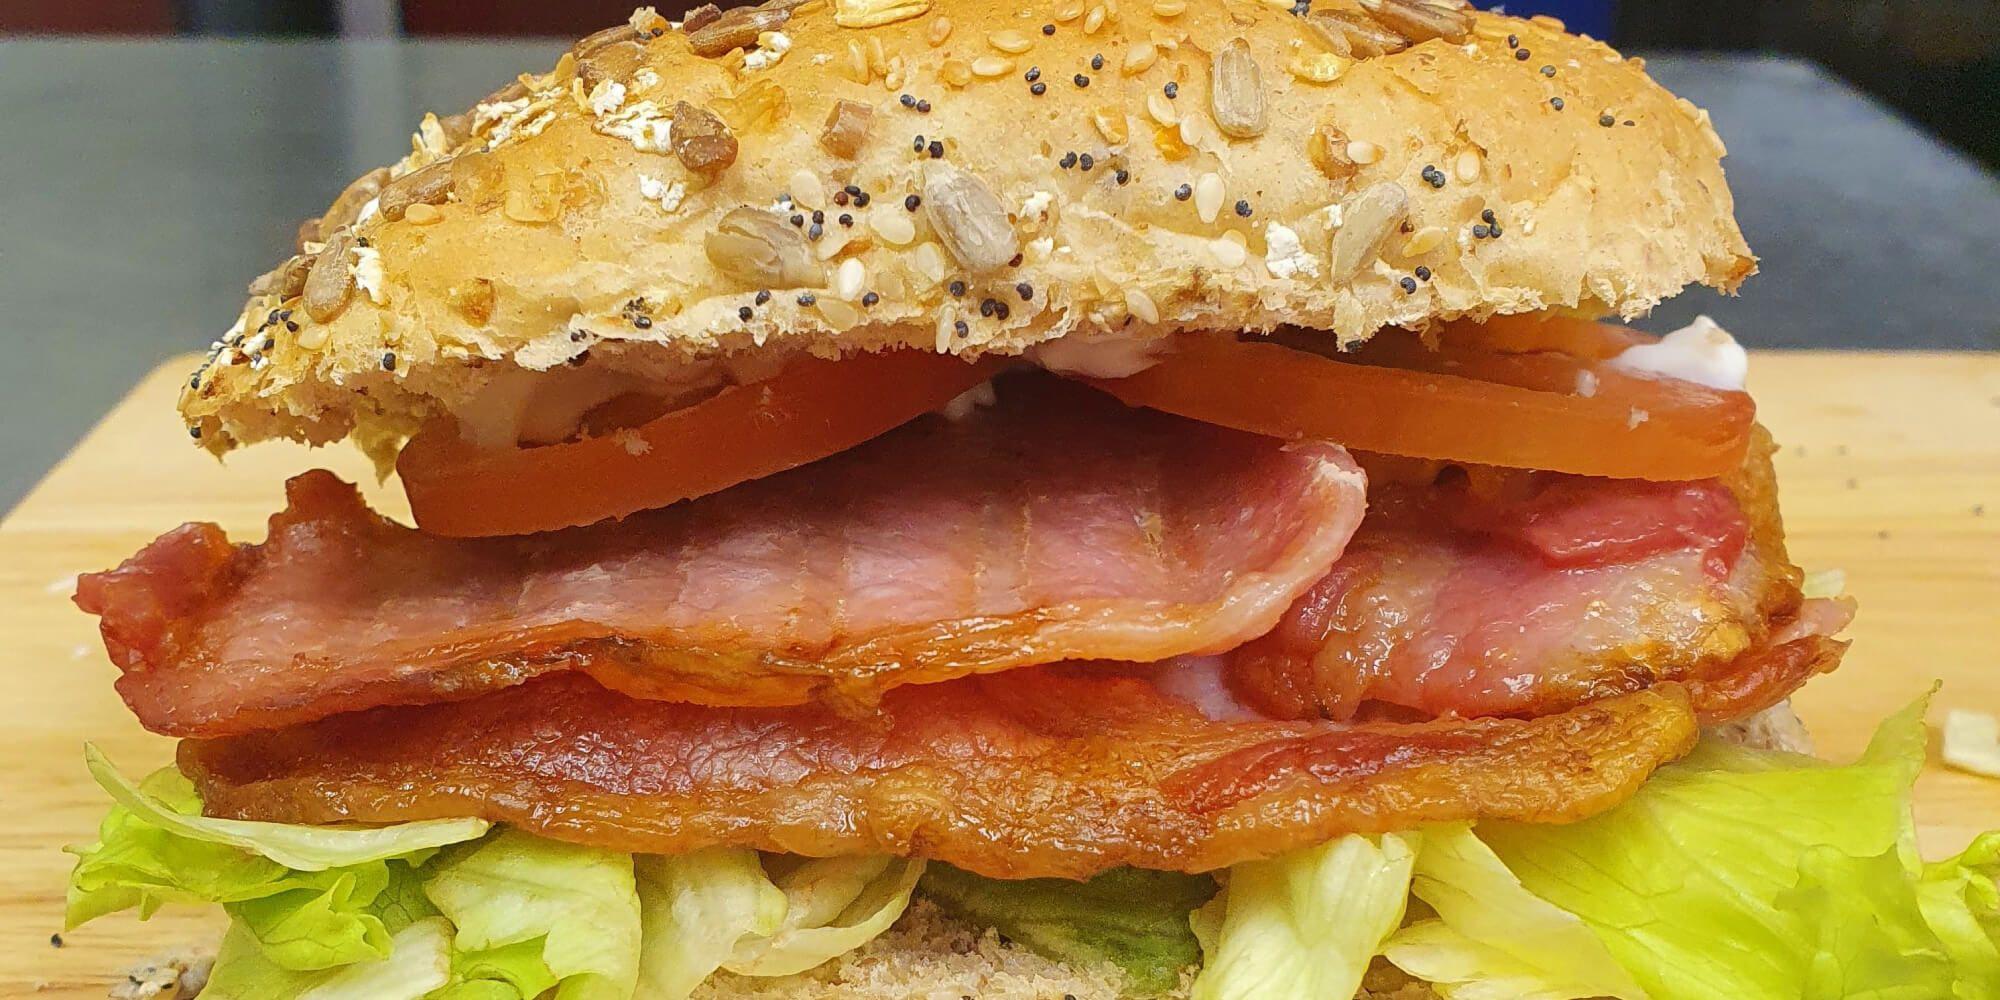 Bacon sandwich at Nosh